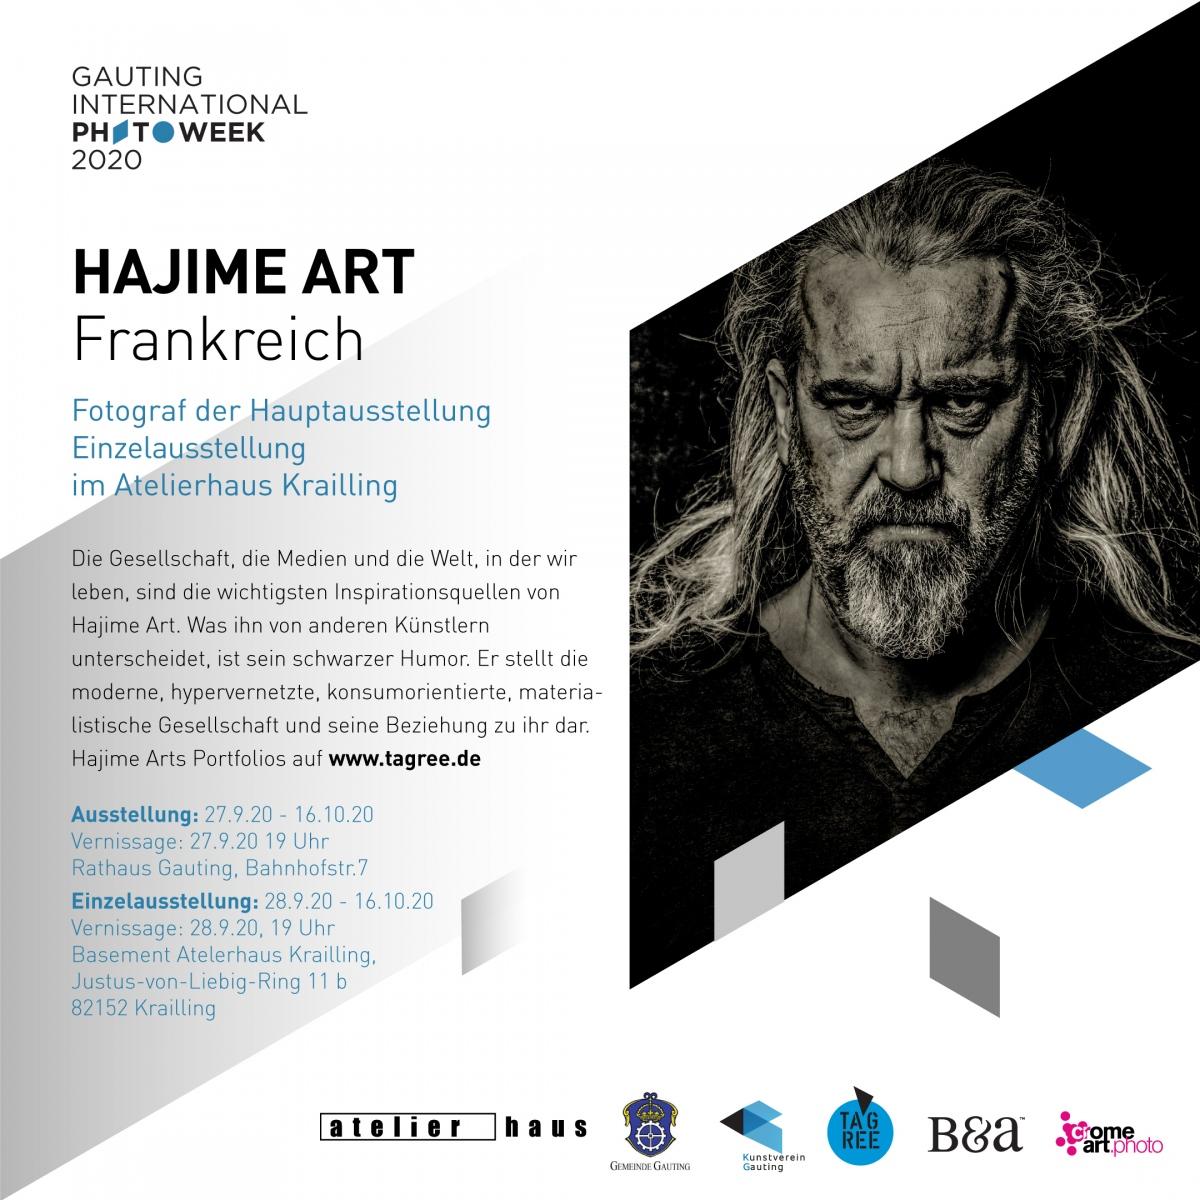 Hajime Art / Frankreich